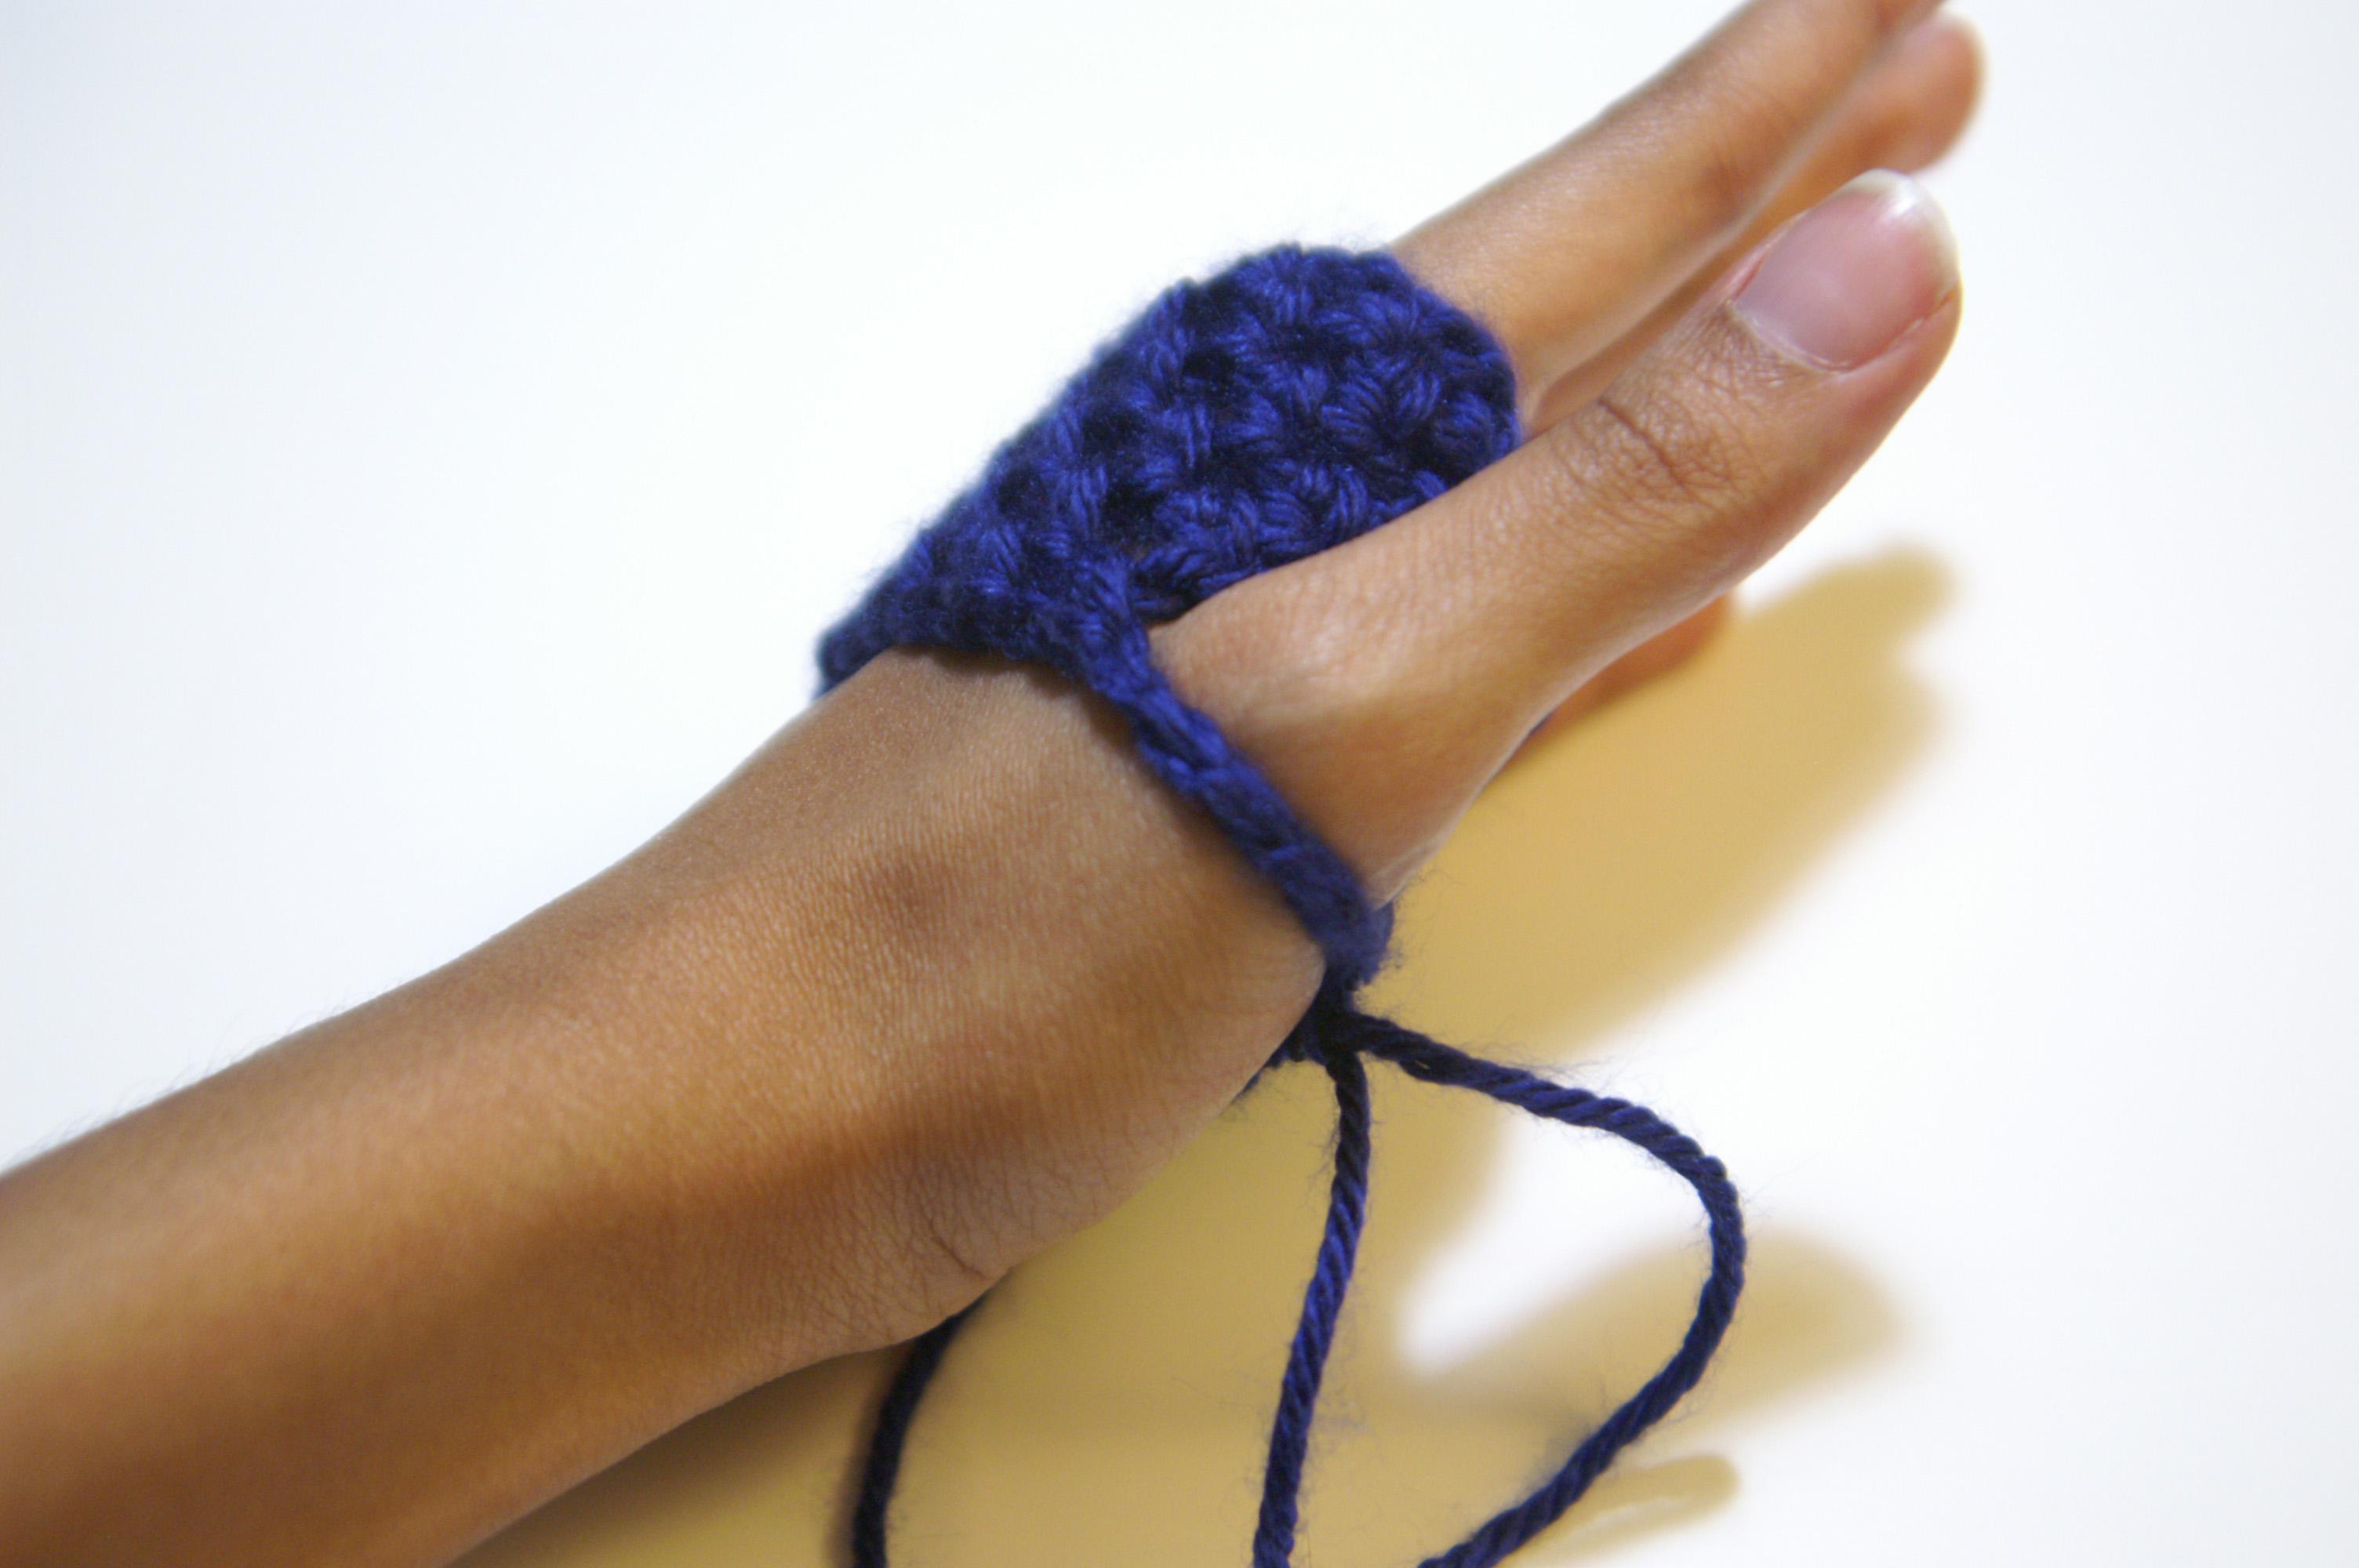 Fingerless gloves diy - Things